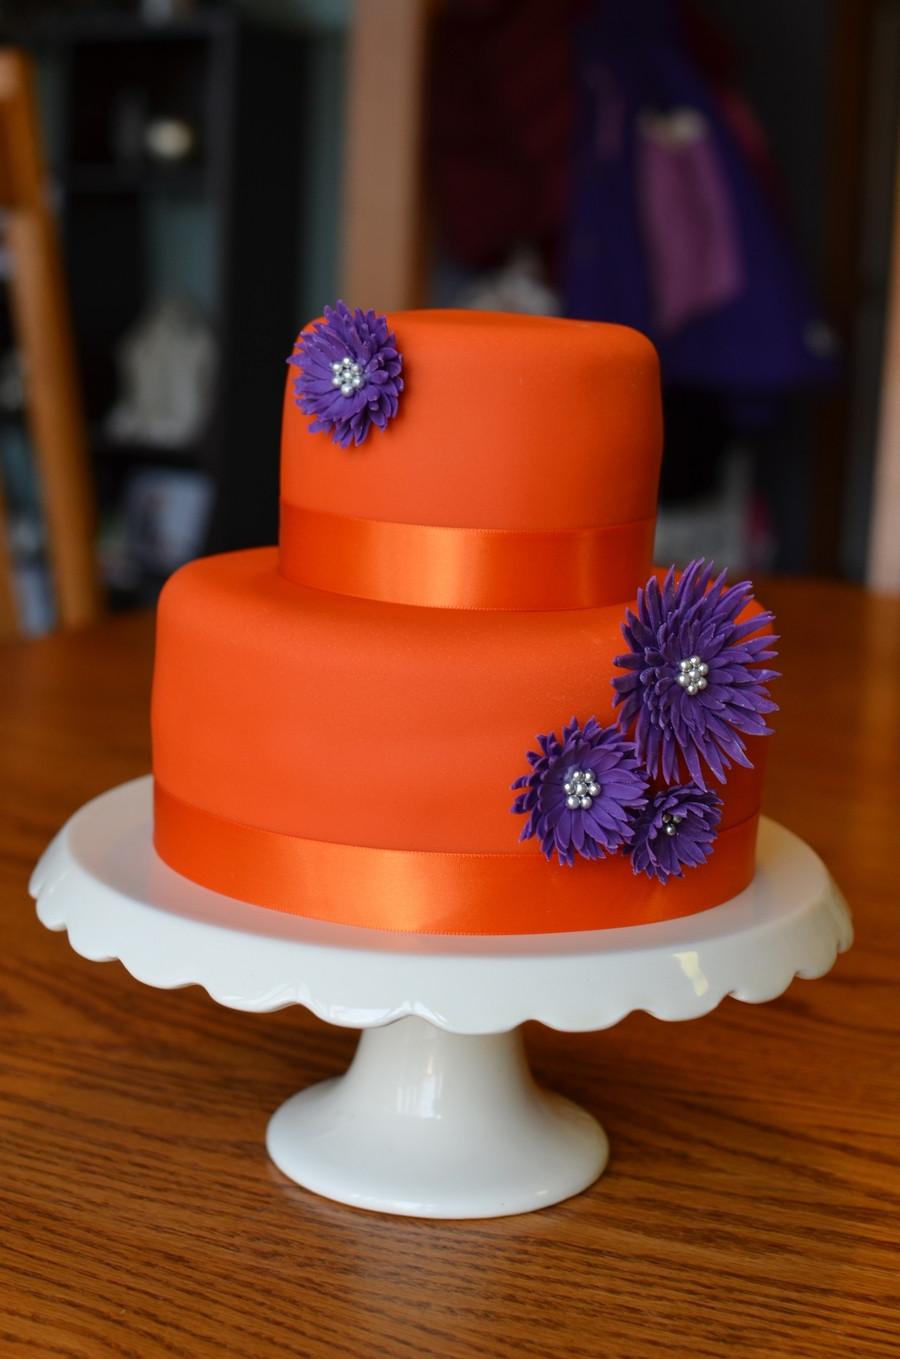 Purple And Orange Wedding Cakes  Orange With Purple Daisies CakeCentral